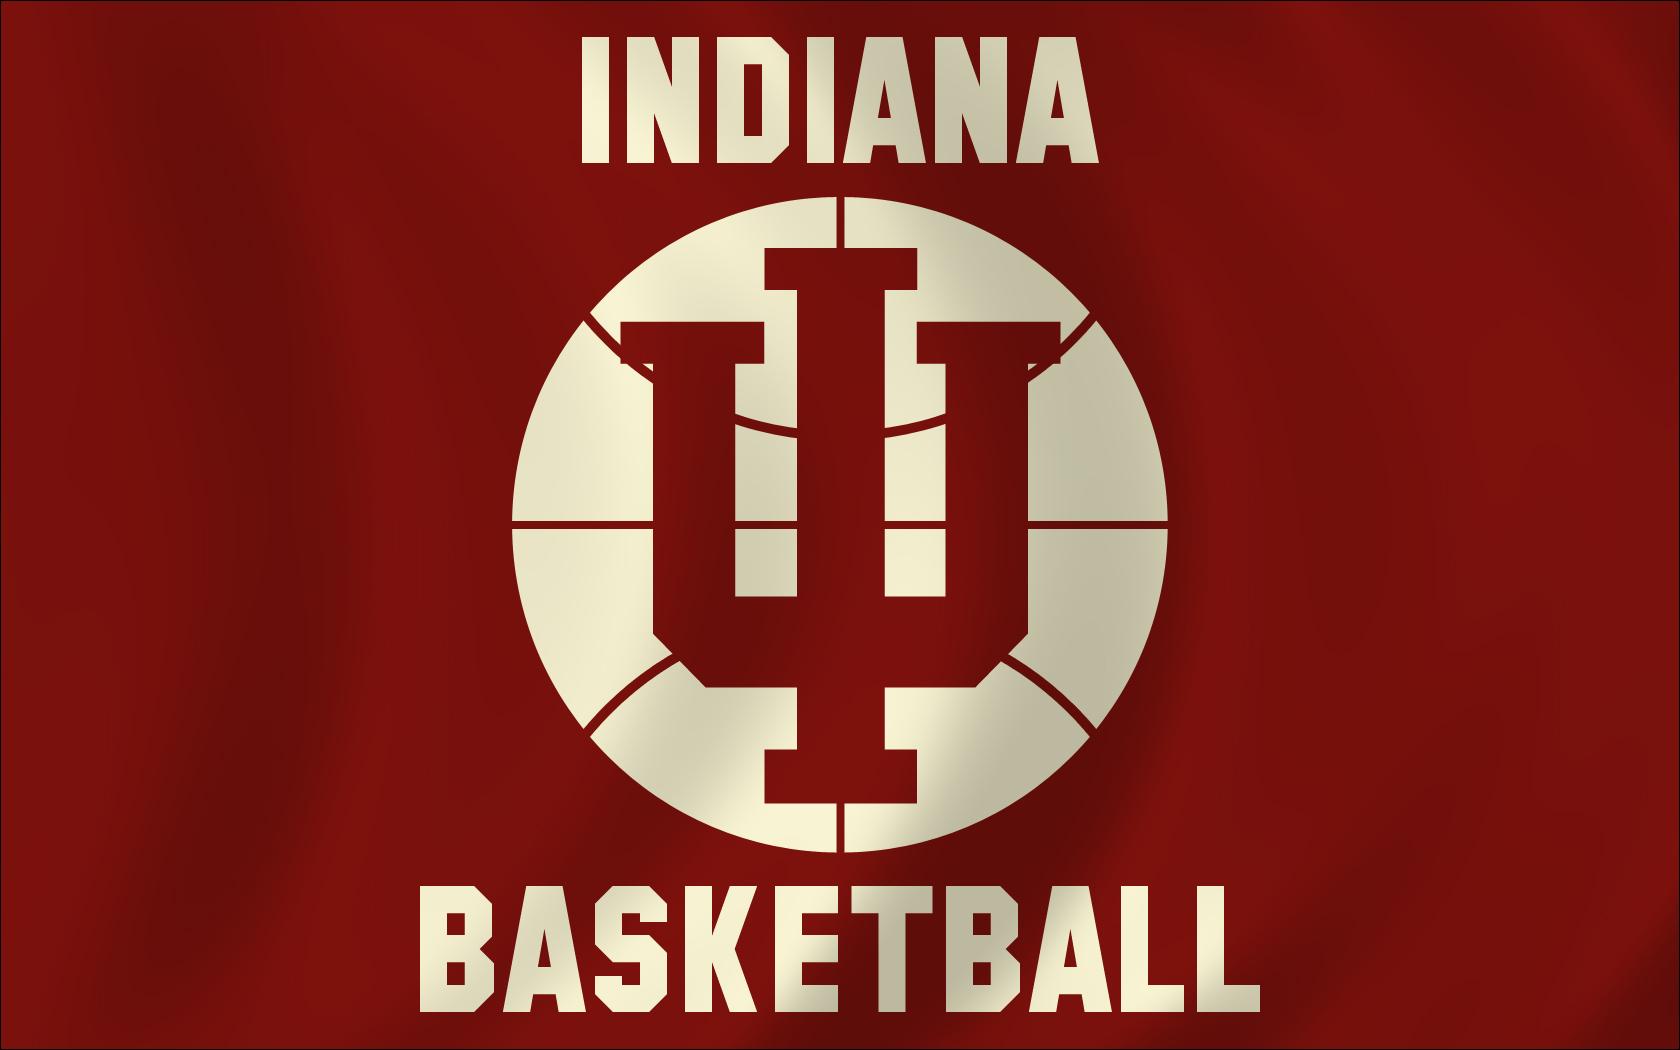 Indiana Basketball Flag by monkeybiziu 1680x1050